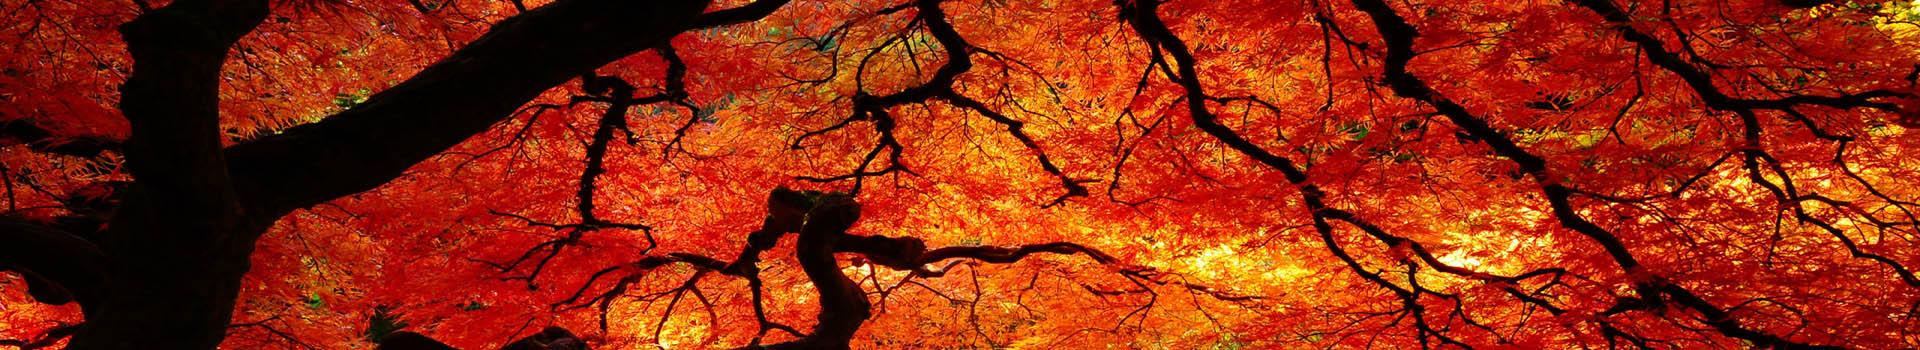 Tree_1_RS_1